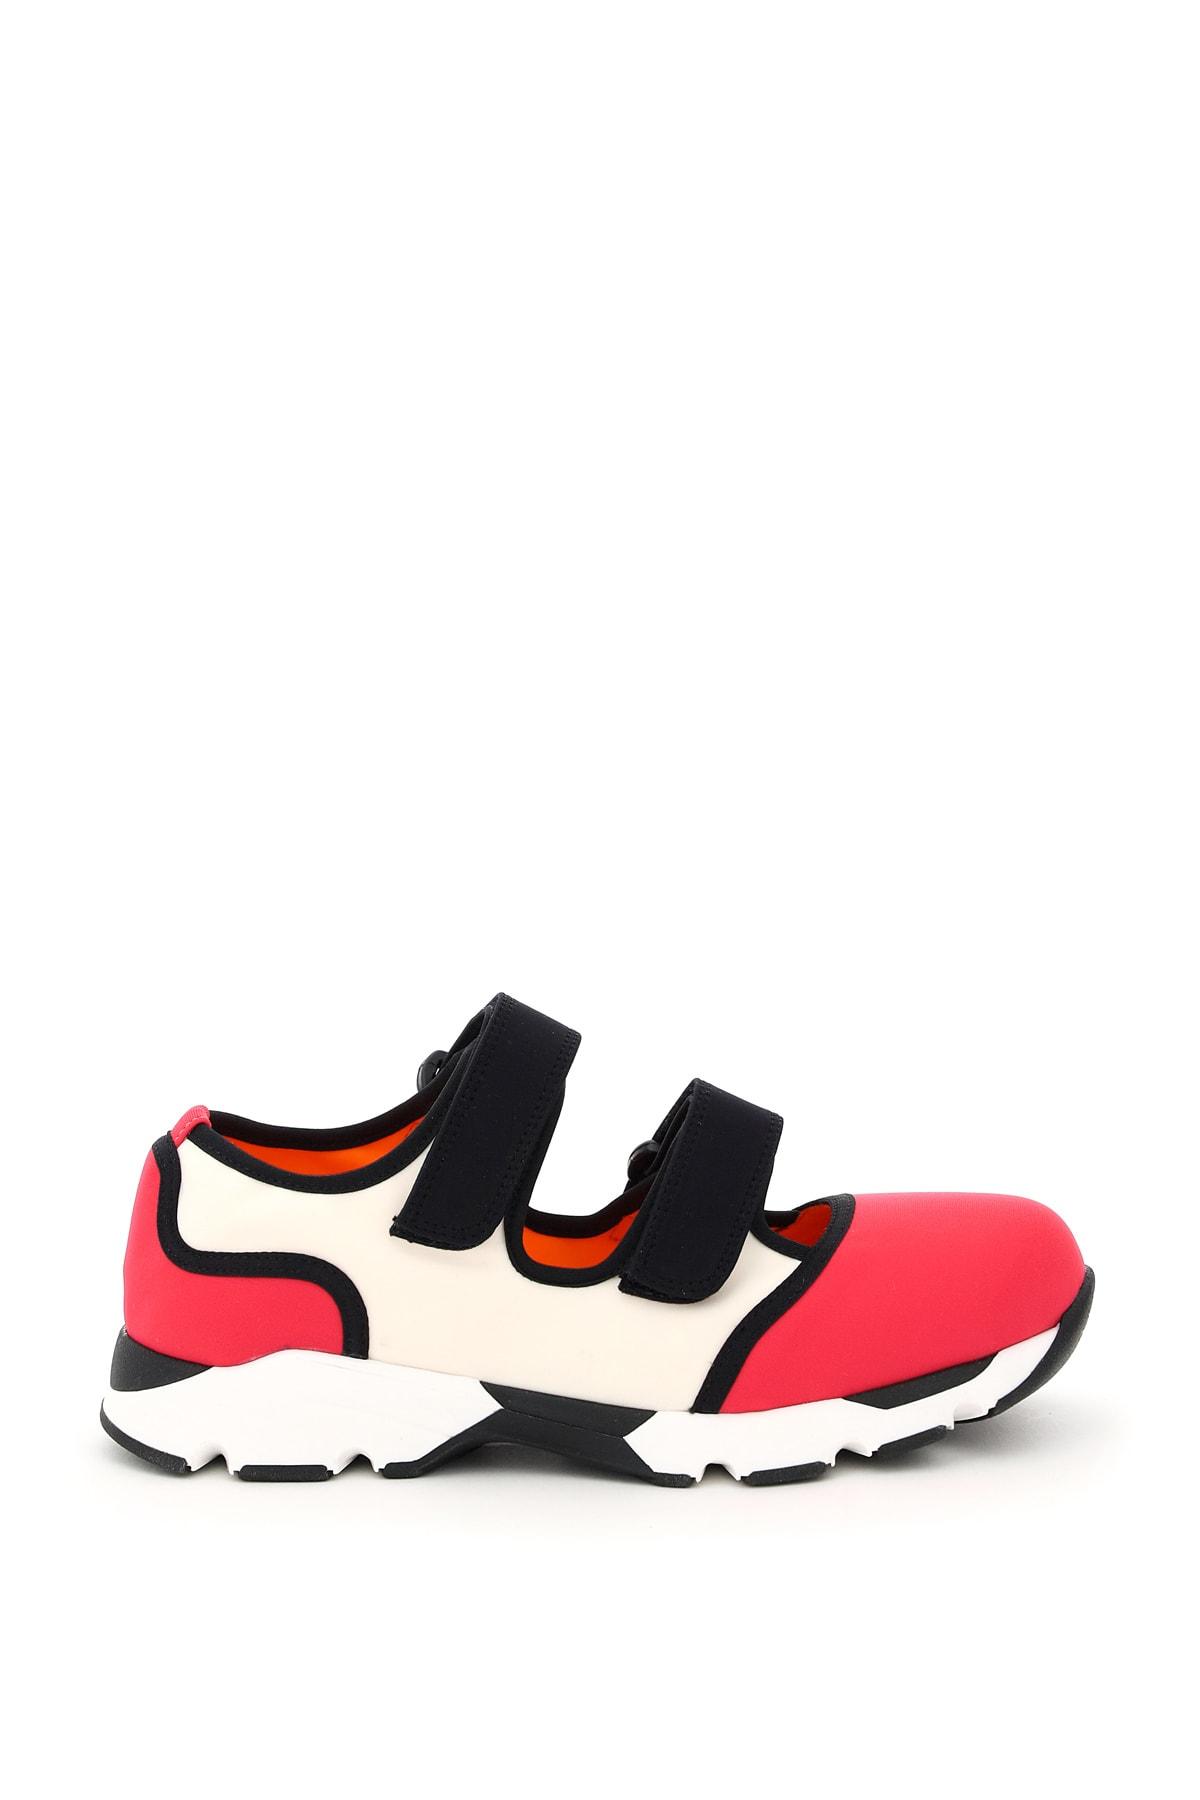 Marni Shoes MULTICOLOR DOUBLE STRAP SNEAKERS